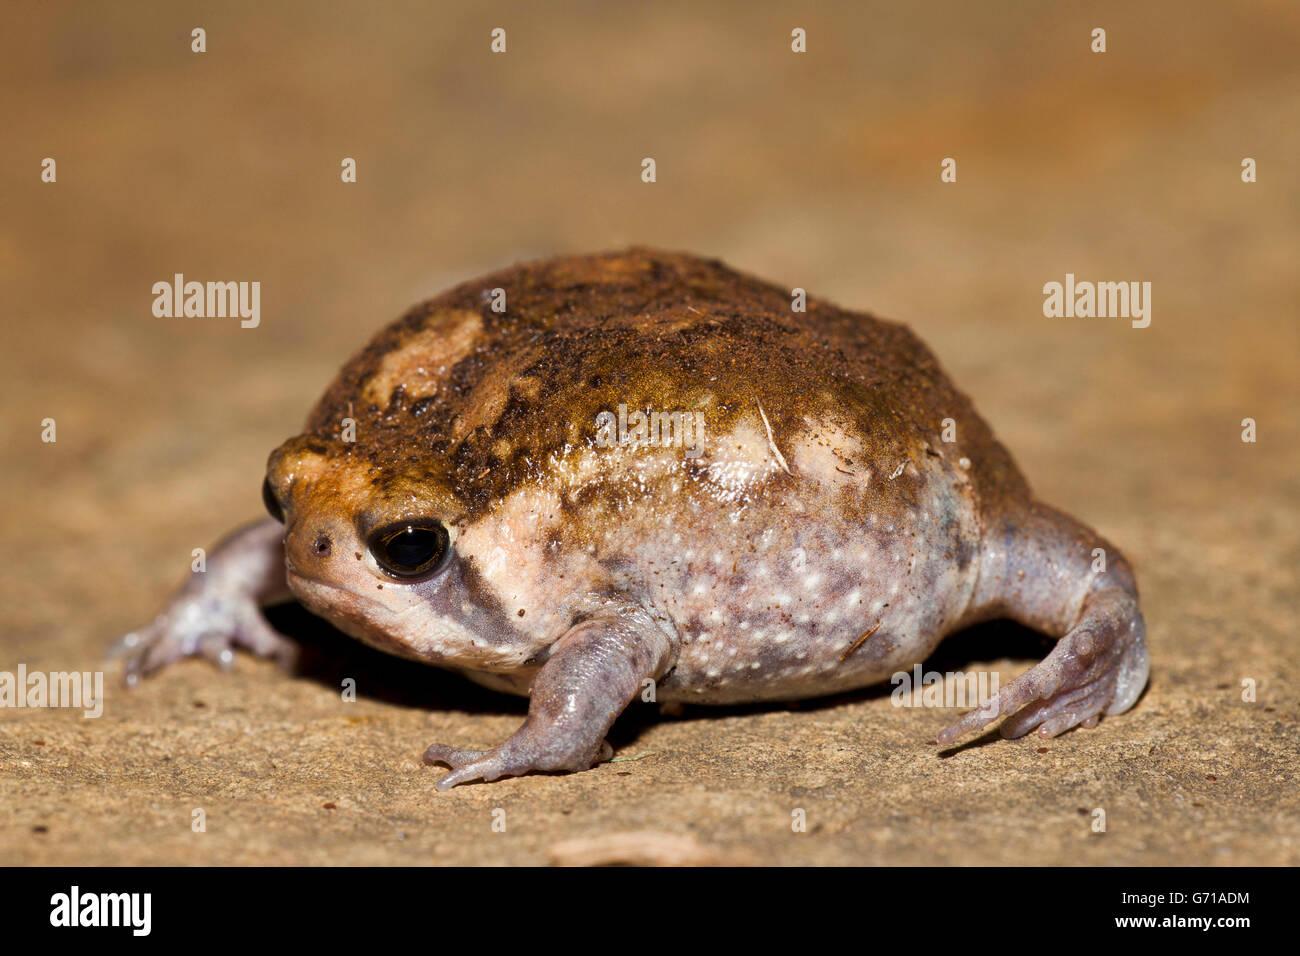 Bushveld Rainfrog, Hidden Valley, KwaZulu-Natal, South Africa / (Breviceps adspersus) - Stock Image